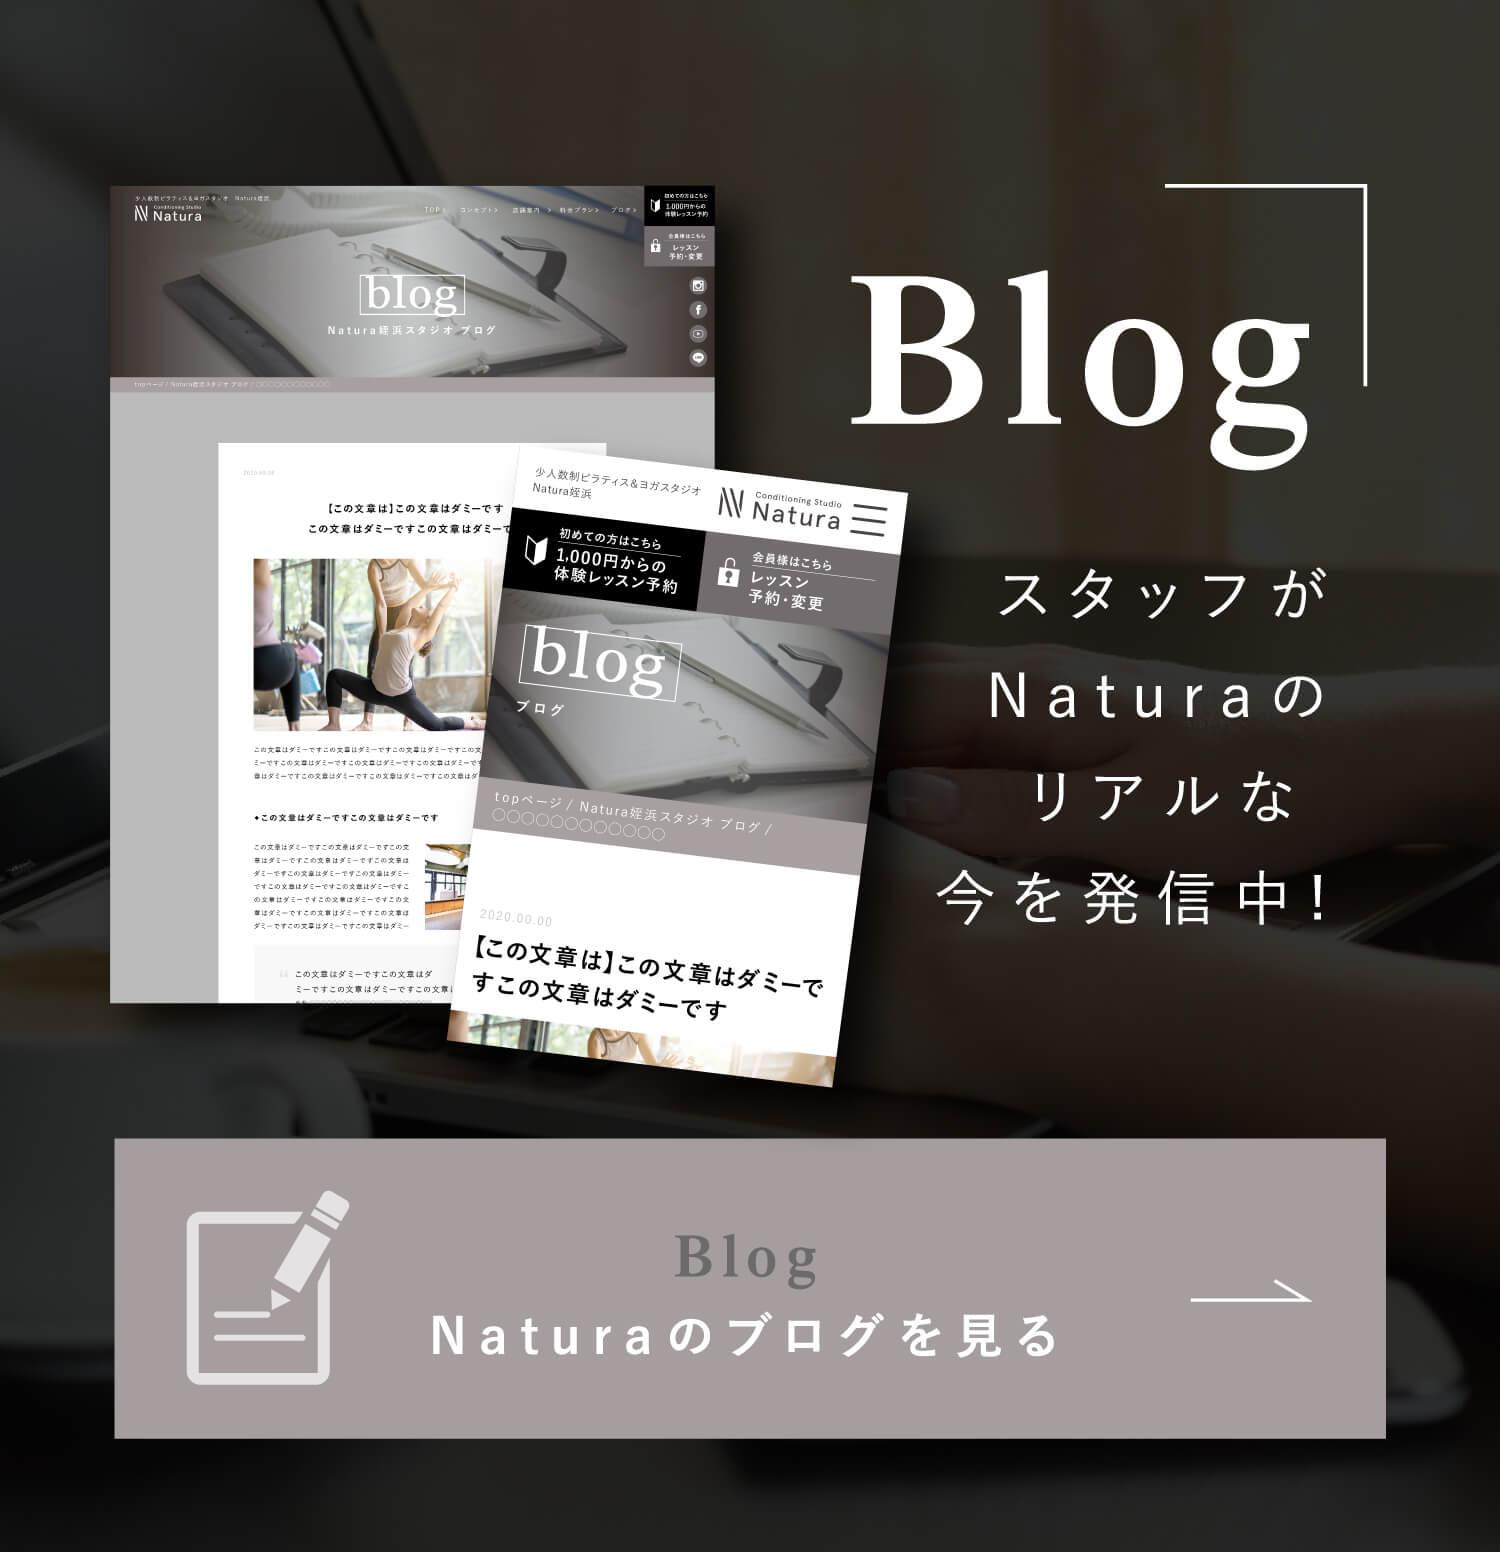 Blog スタッフがNaturaのリアルな今を発信中! Blog Naturaのブログを見る